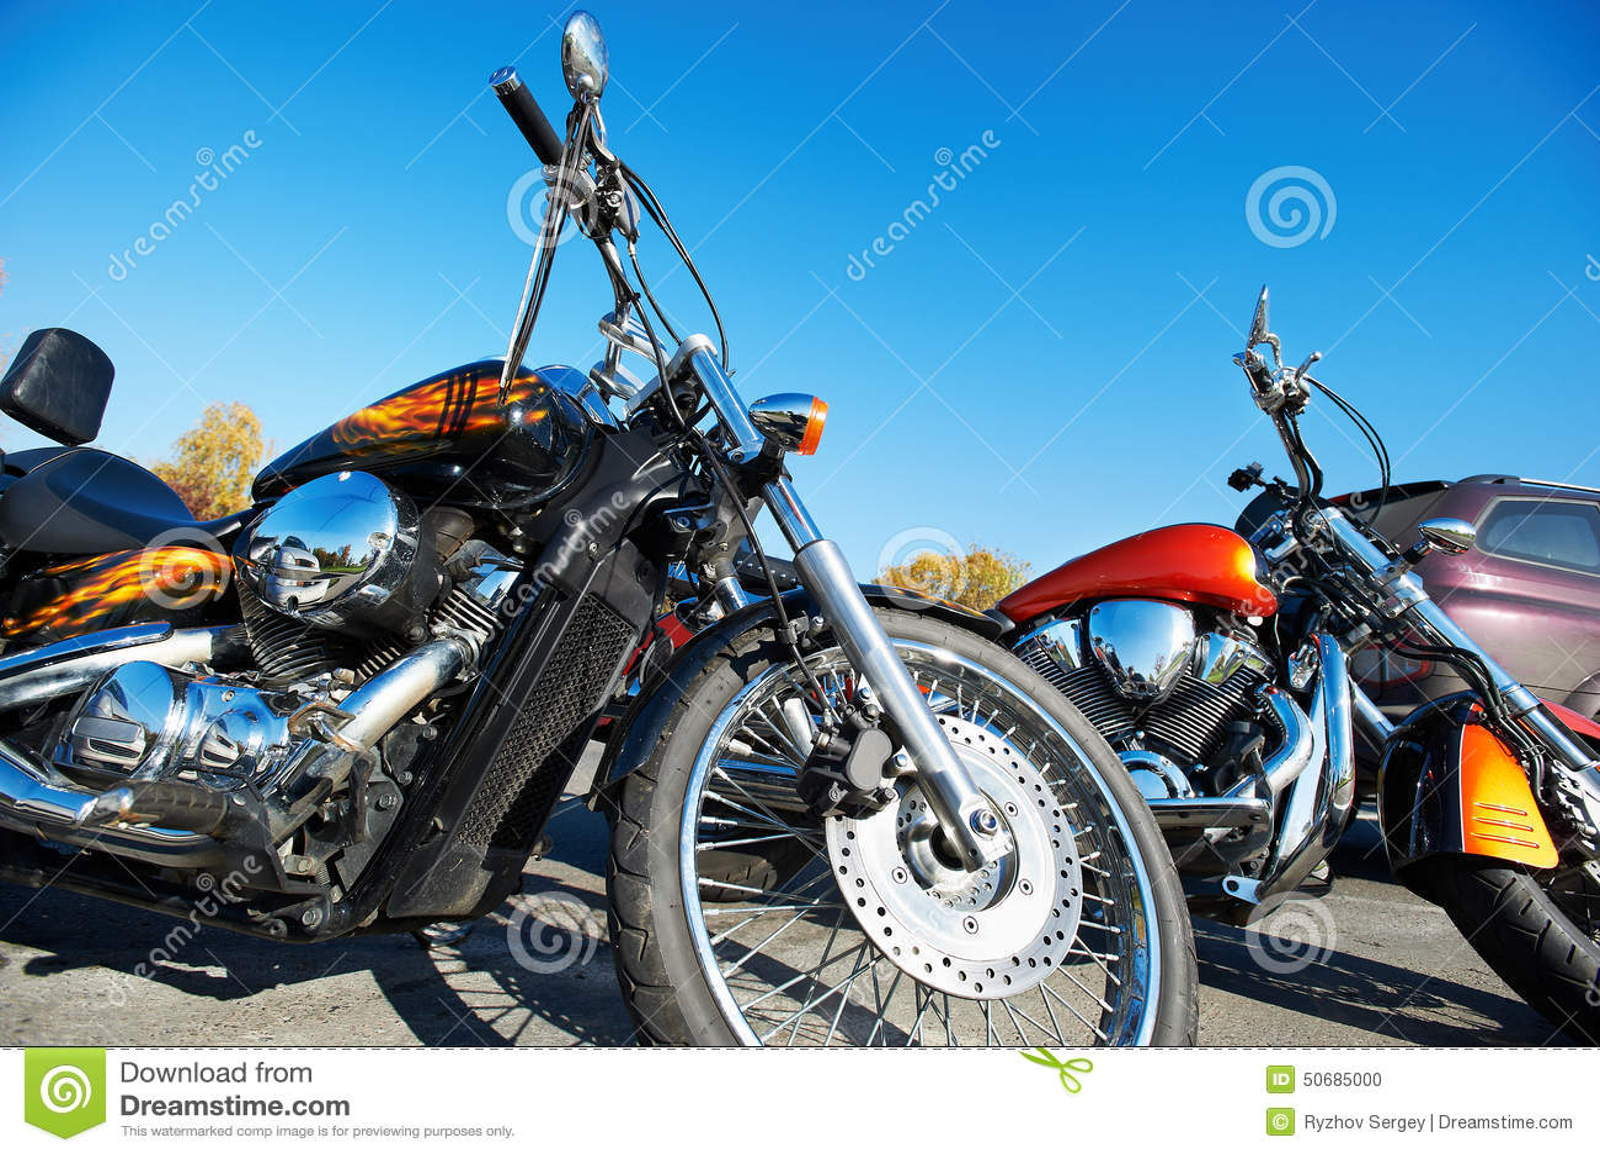 Download 美丽的镀铬物经典之作摩托车 库存照片. 图片 包括有 经典, 关闭, 轮胎, 运输, 夏天, 减速火箭, 天空 - 50685000